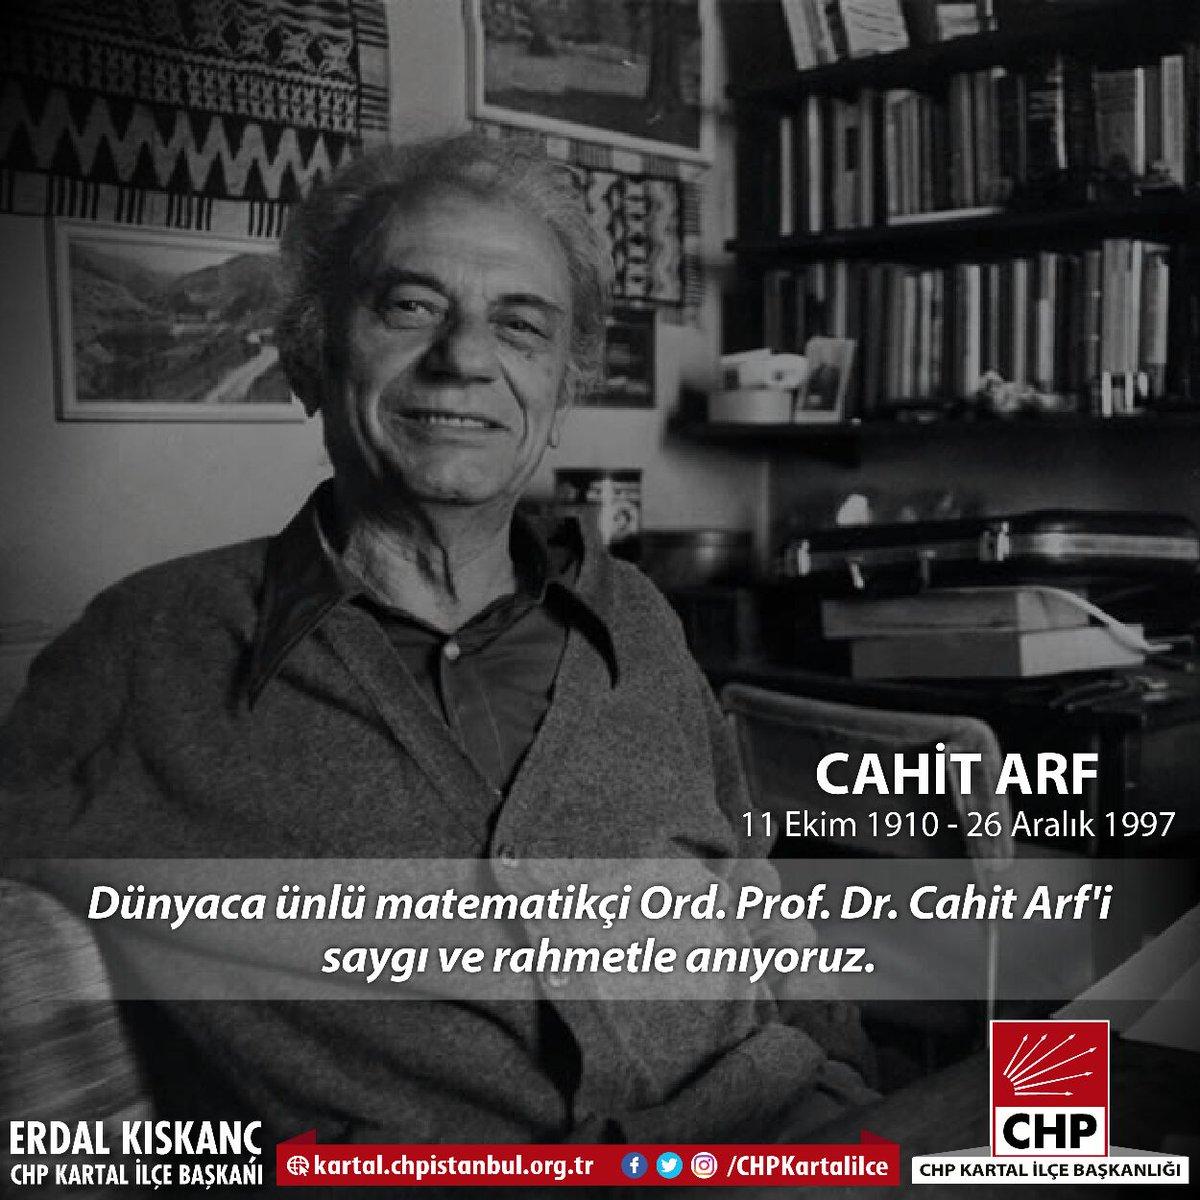 Chp Kartal On Twitter Dünyaca ünlü Matematikçi Ord Prof Dr